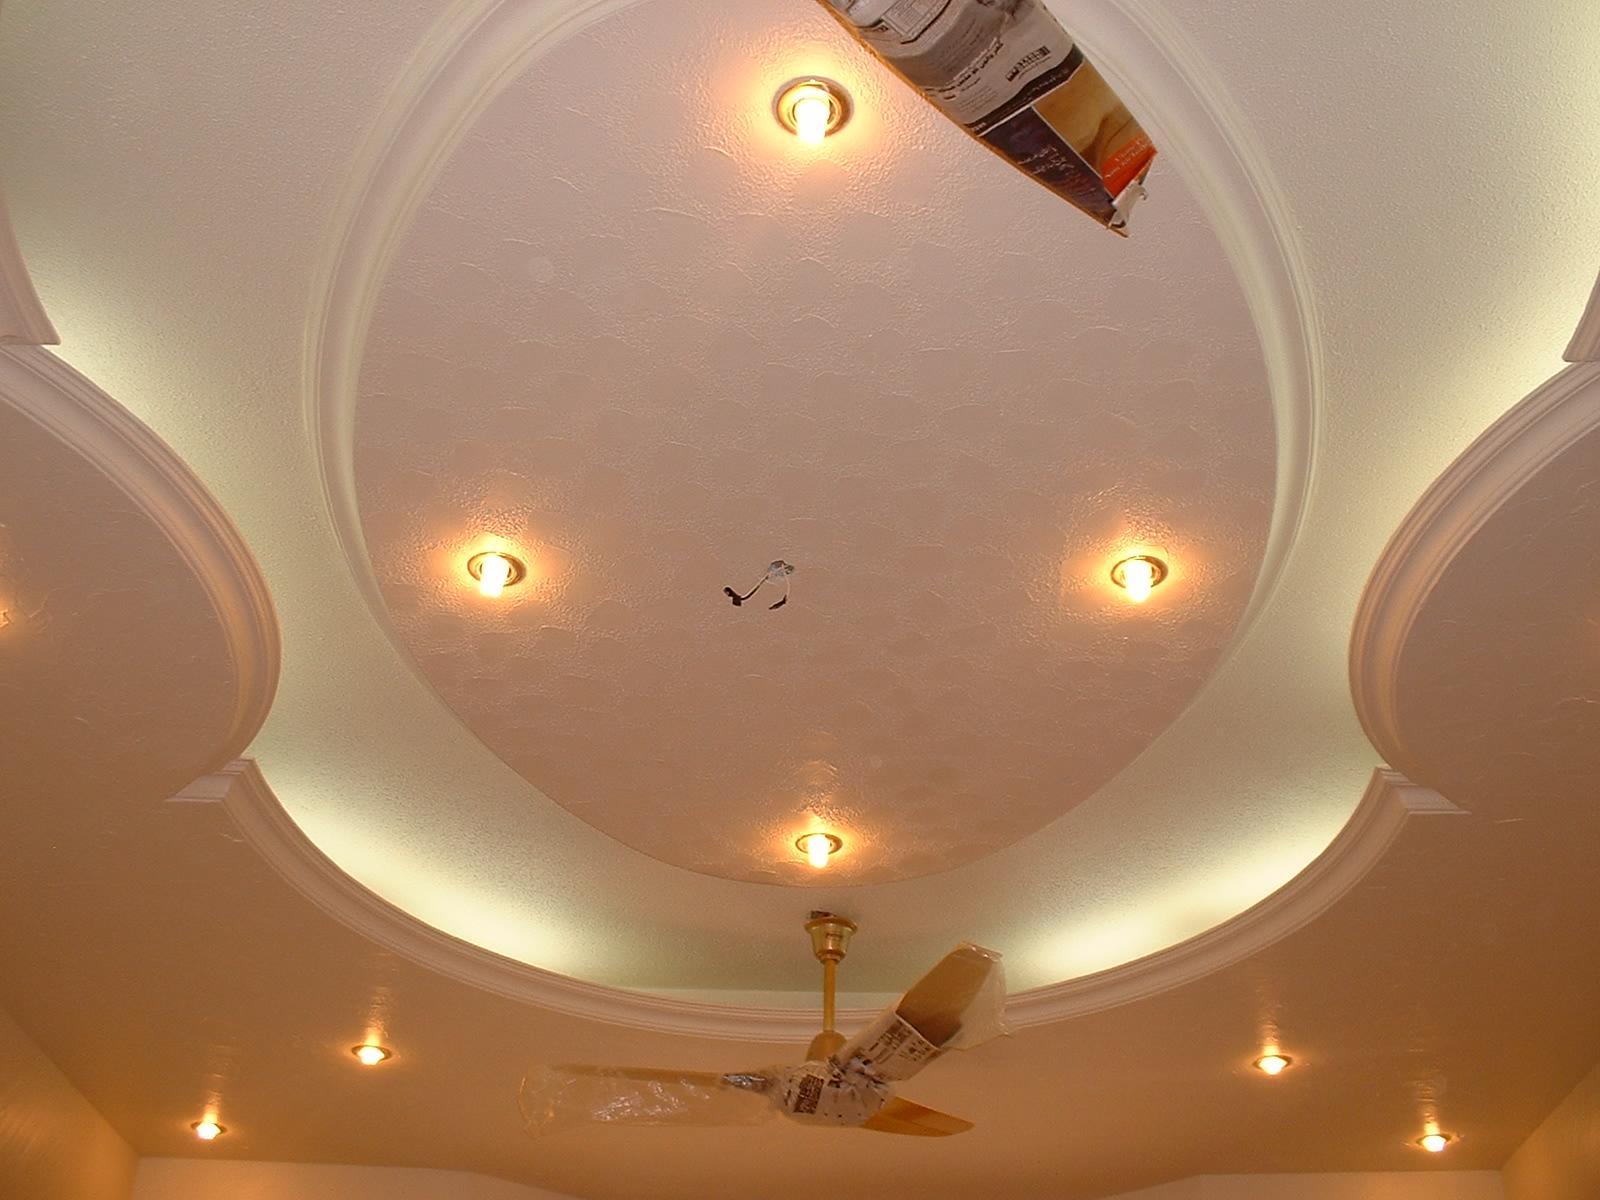 POP ceiling with ceiling fans and lighting GharExpert : 1022010122330 from www.gharexpert.com size 1600 x 1200 jpeg 163kB